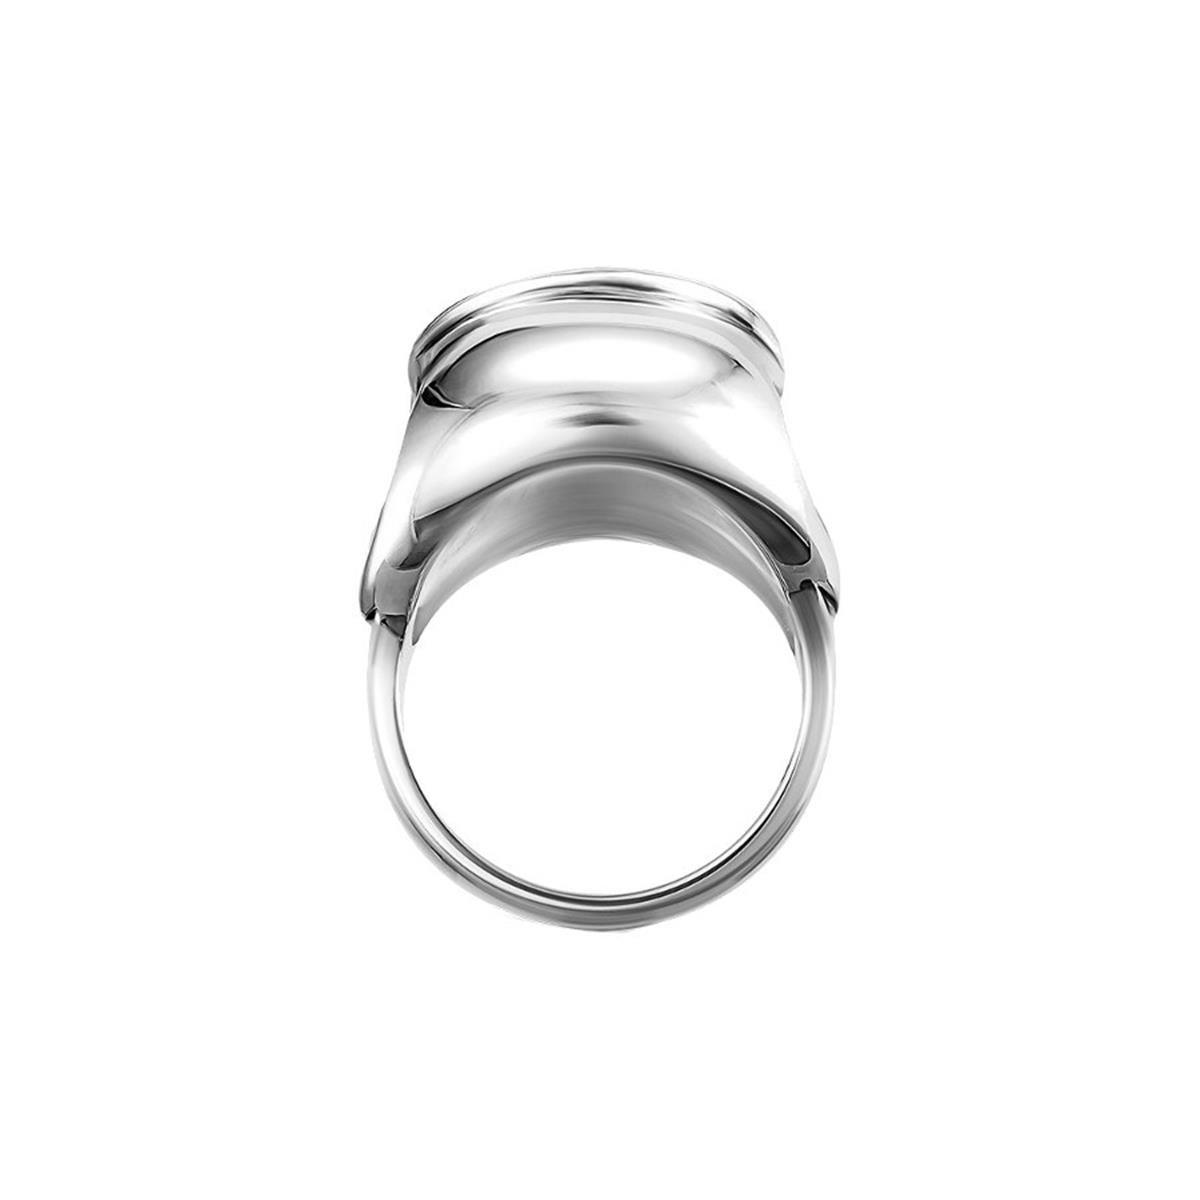 b7b1db4cd2db Thomas Sabo Unisex Ring Skull 925 Sterling Silver